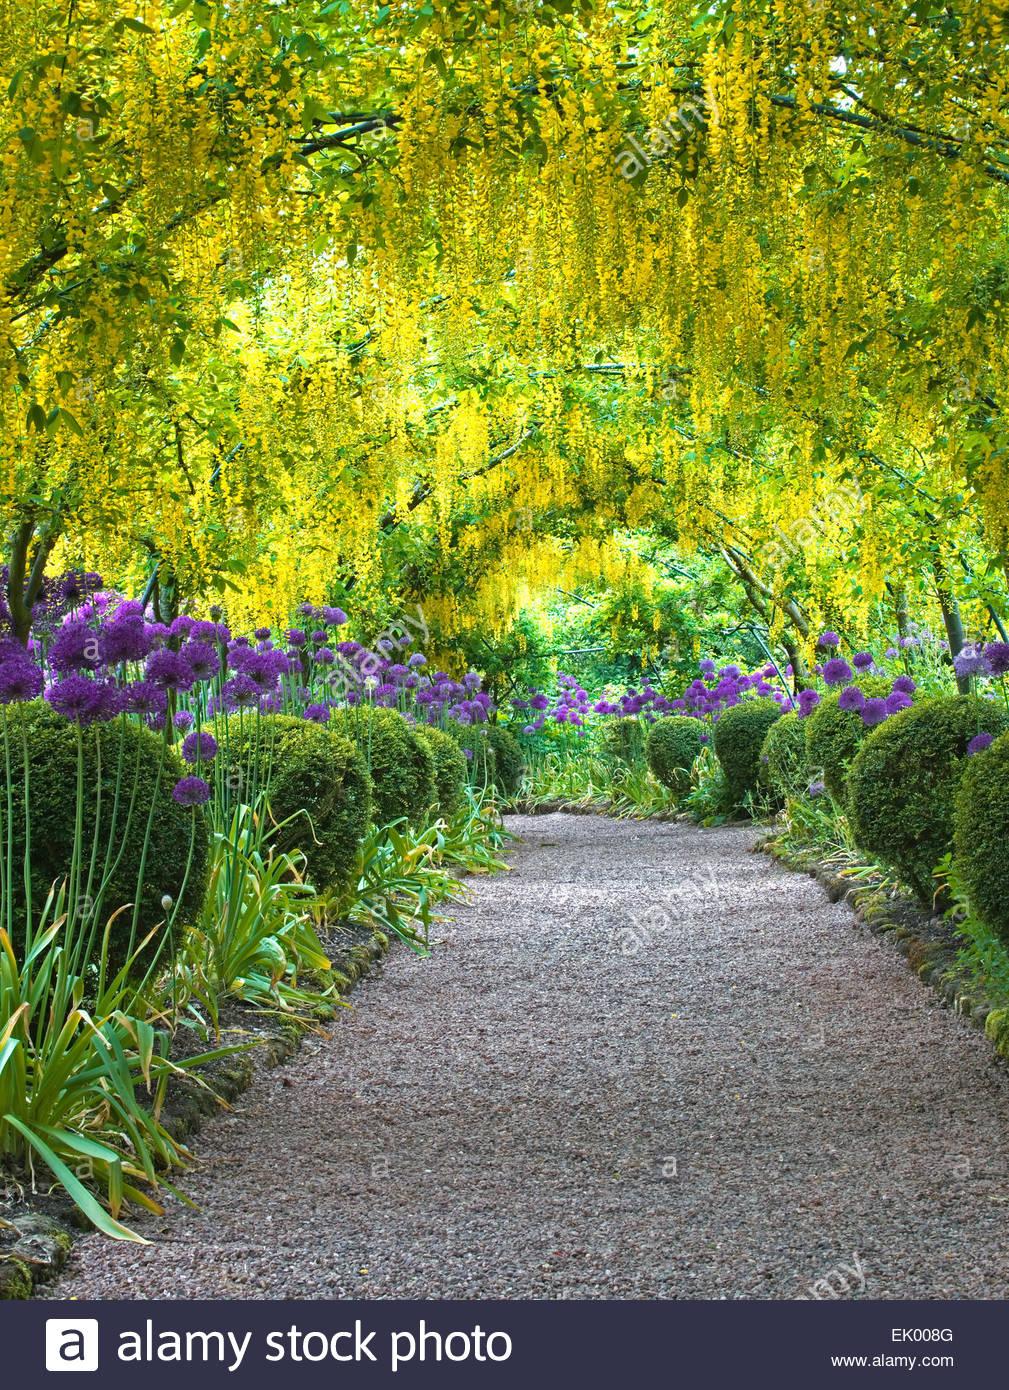 Laburnam arch with Allium borders - Dorothy Clive Gardens, UK - Stock Image